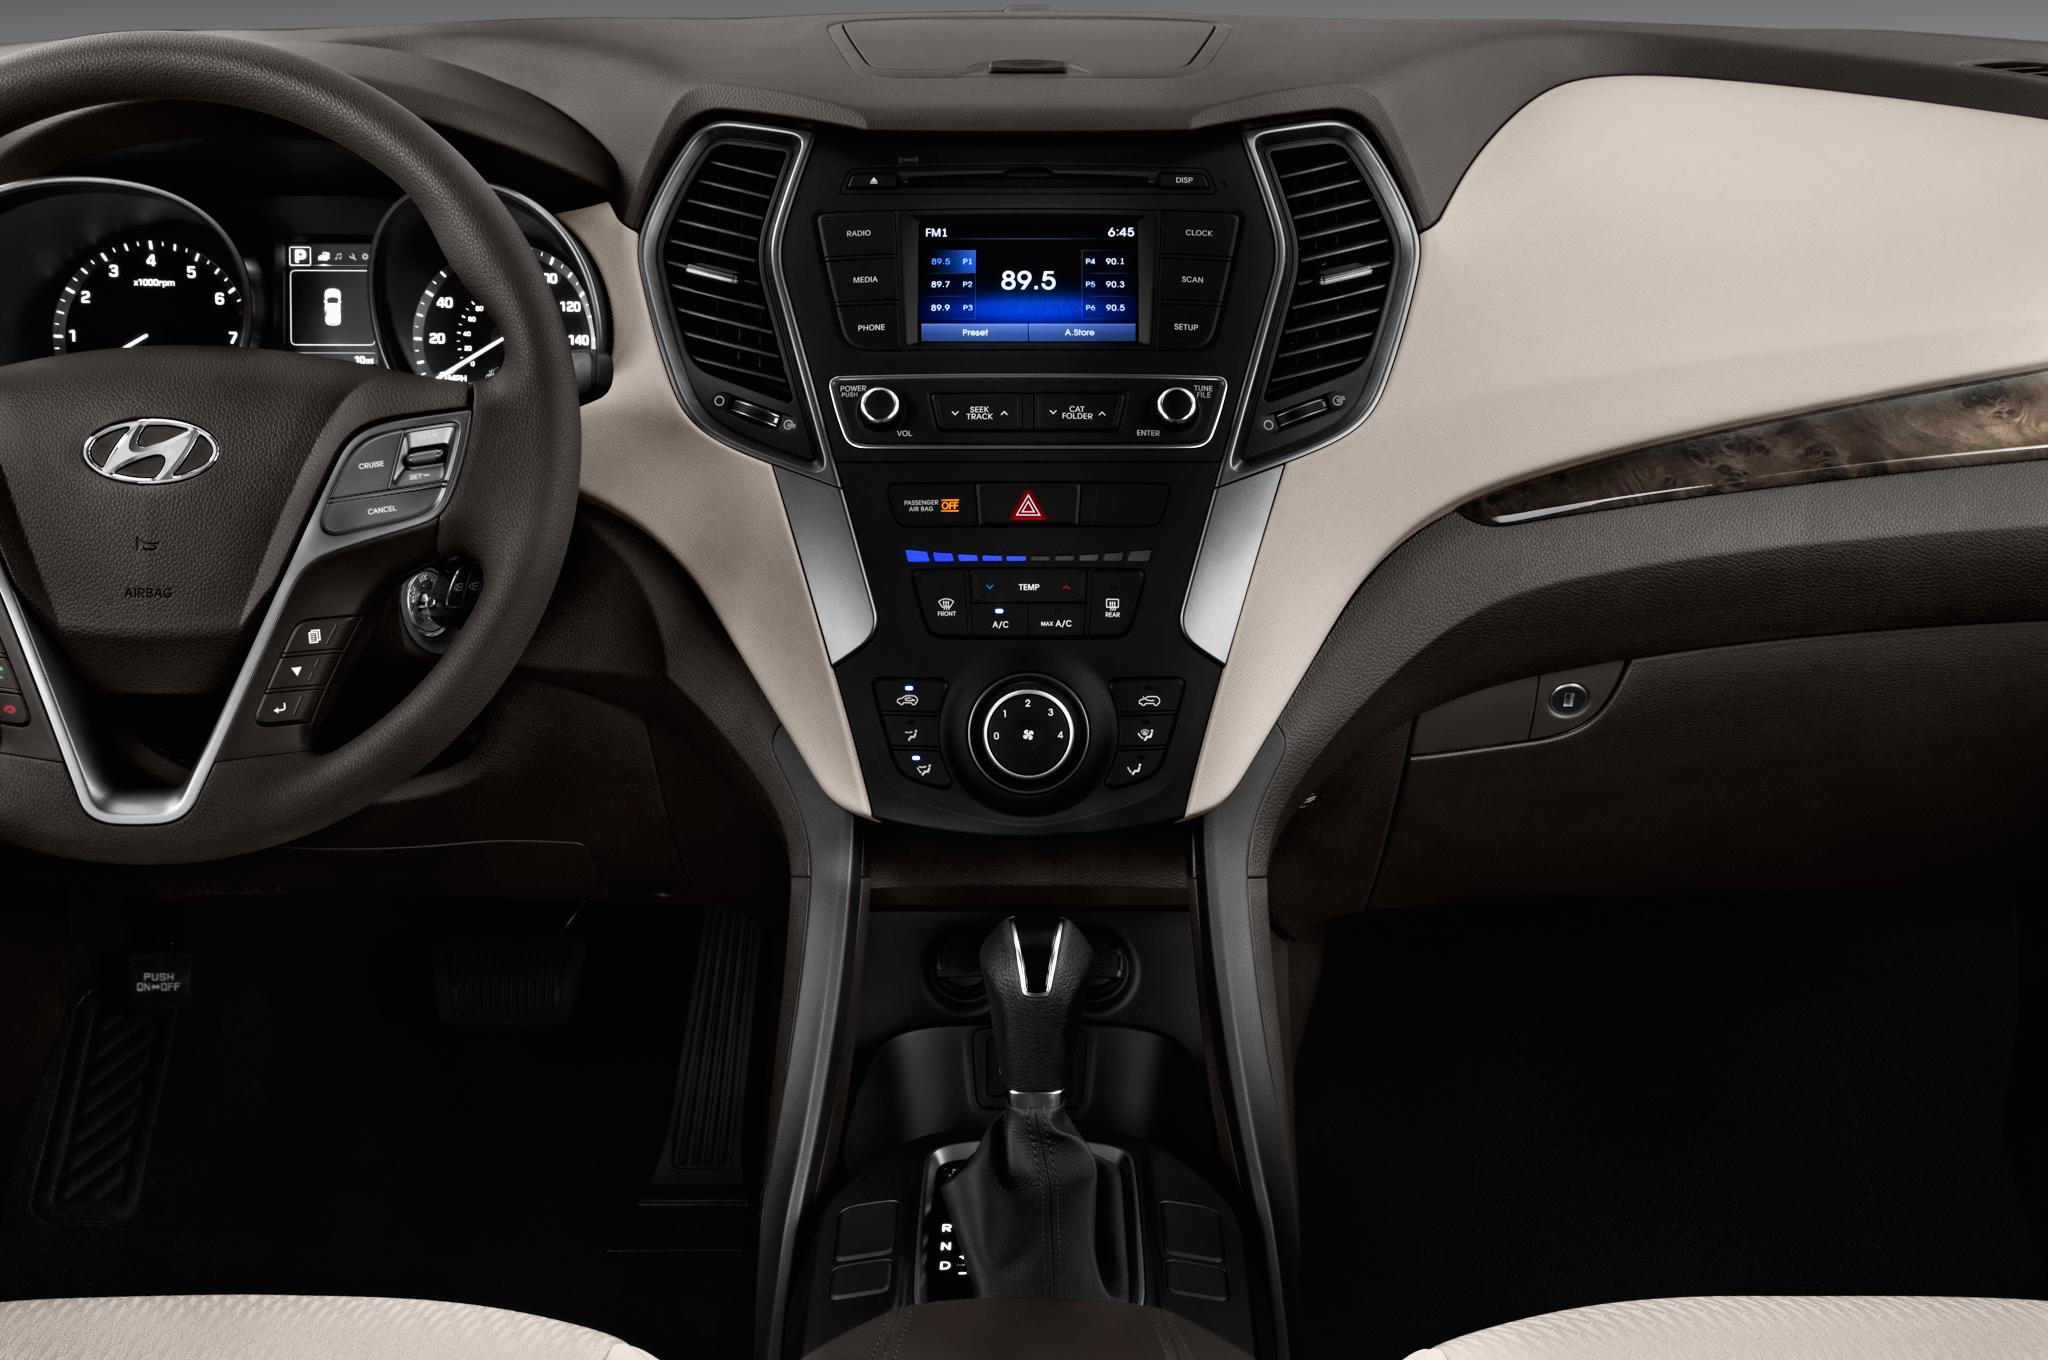 2017 hyundai santa fe sport iihs testing - Hyundai santa fe sport interior photos ...